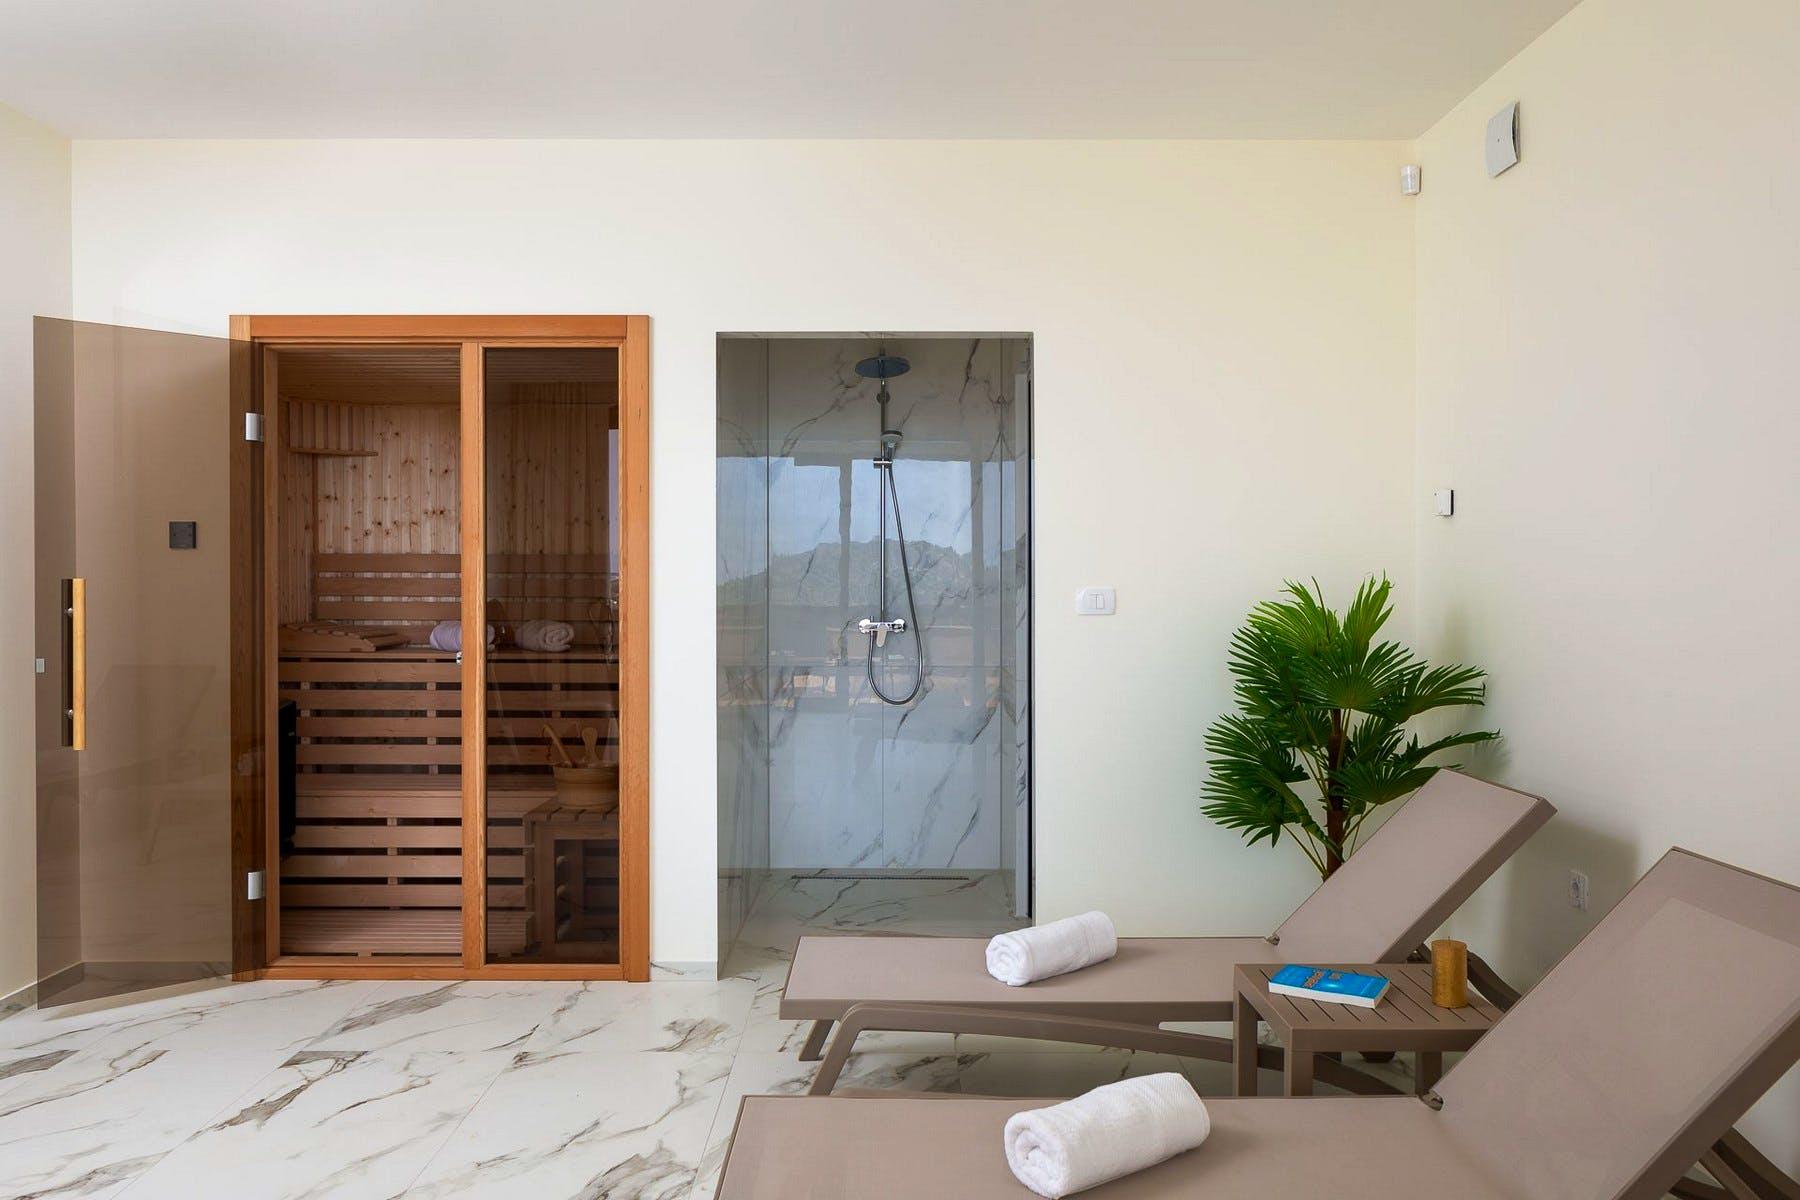 Wellness area with sauna and shower